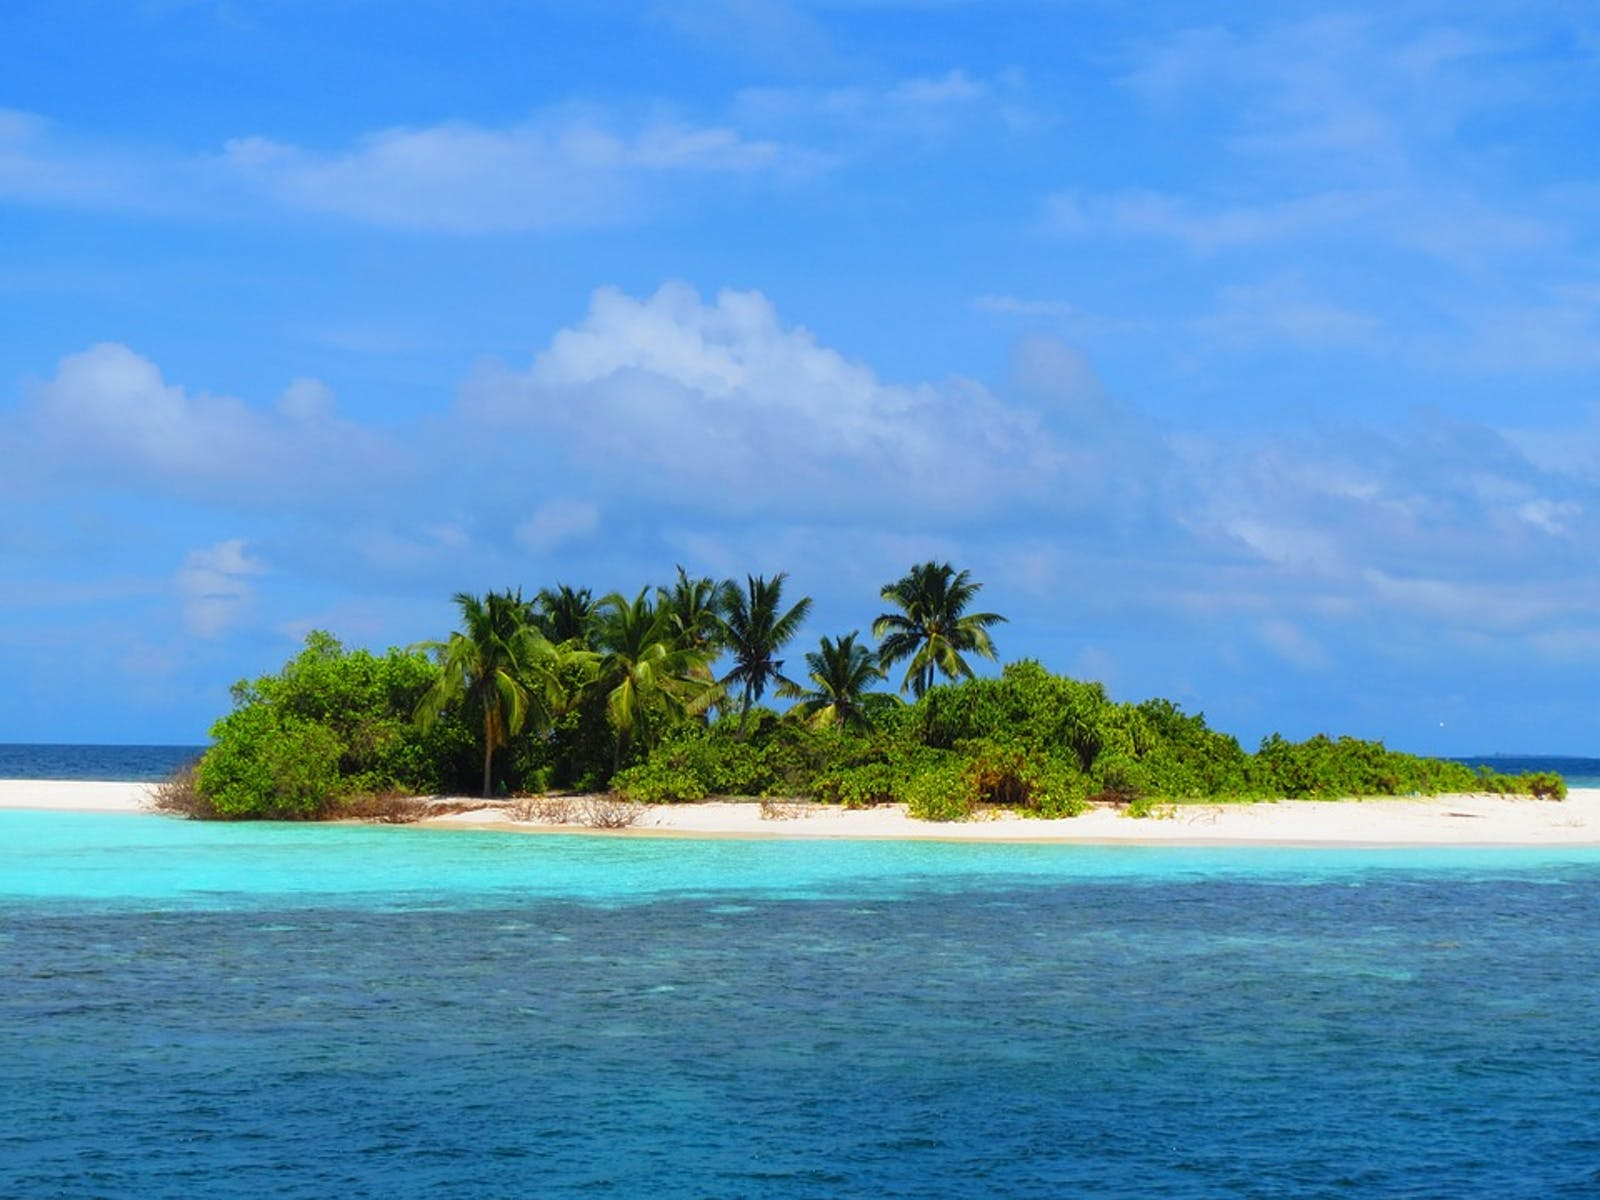 Maldives-Lakshadweep-Chagos Archipelago Tropical Moist Forests